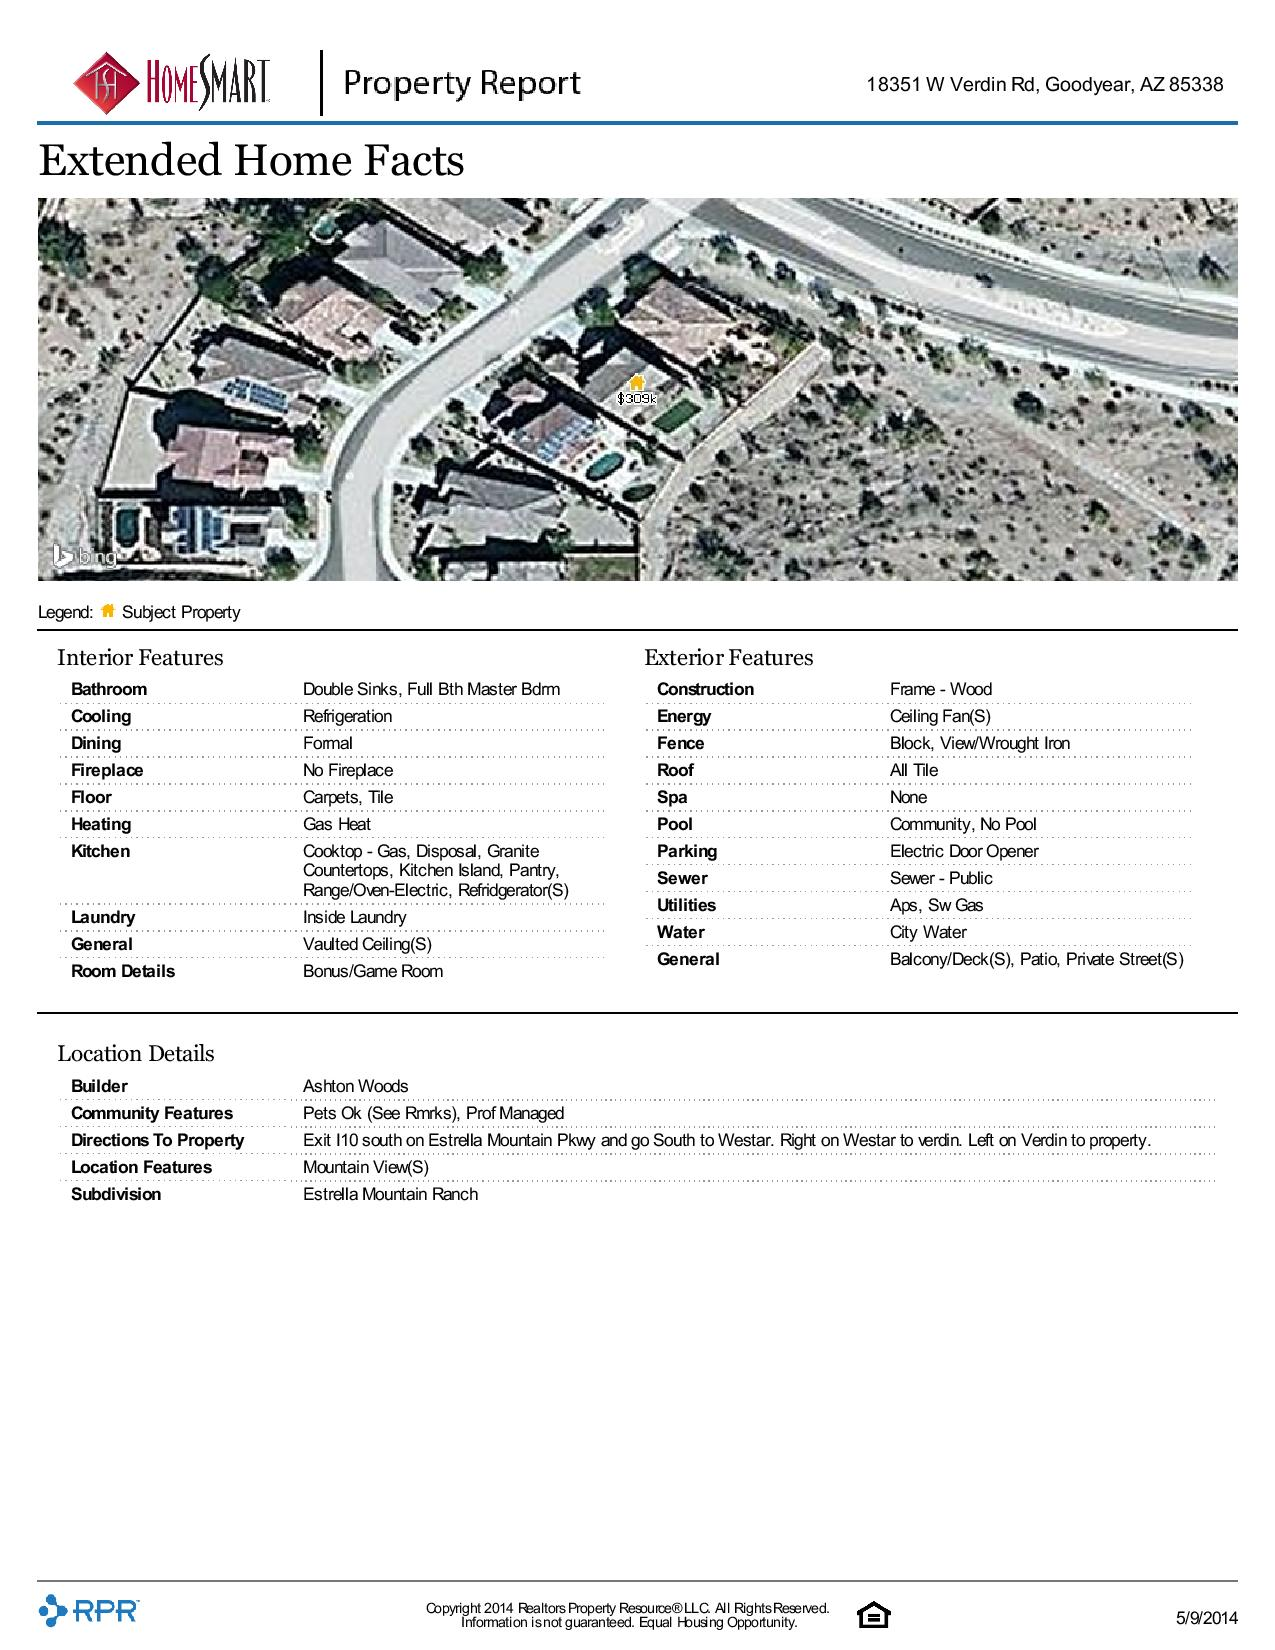 18351-W-Verdin-Rd-Goodyear-AZ-85338-page-004